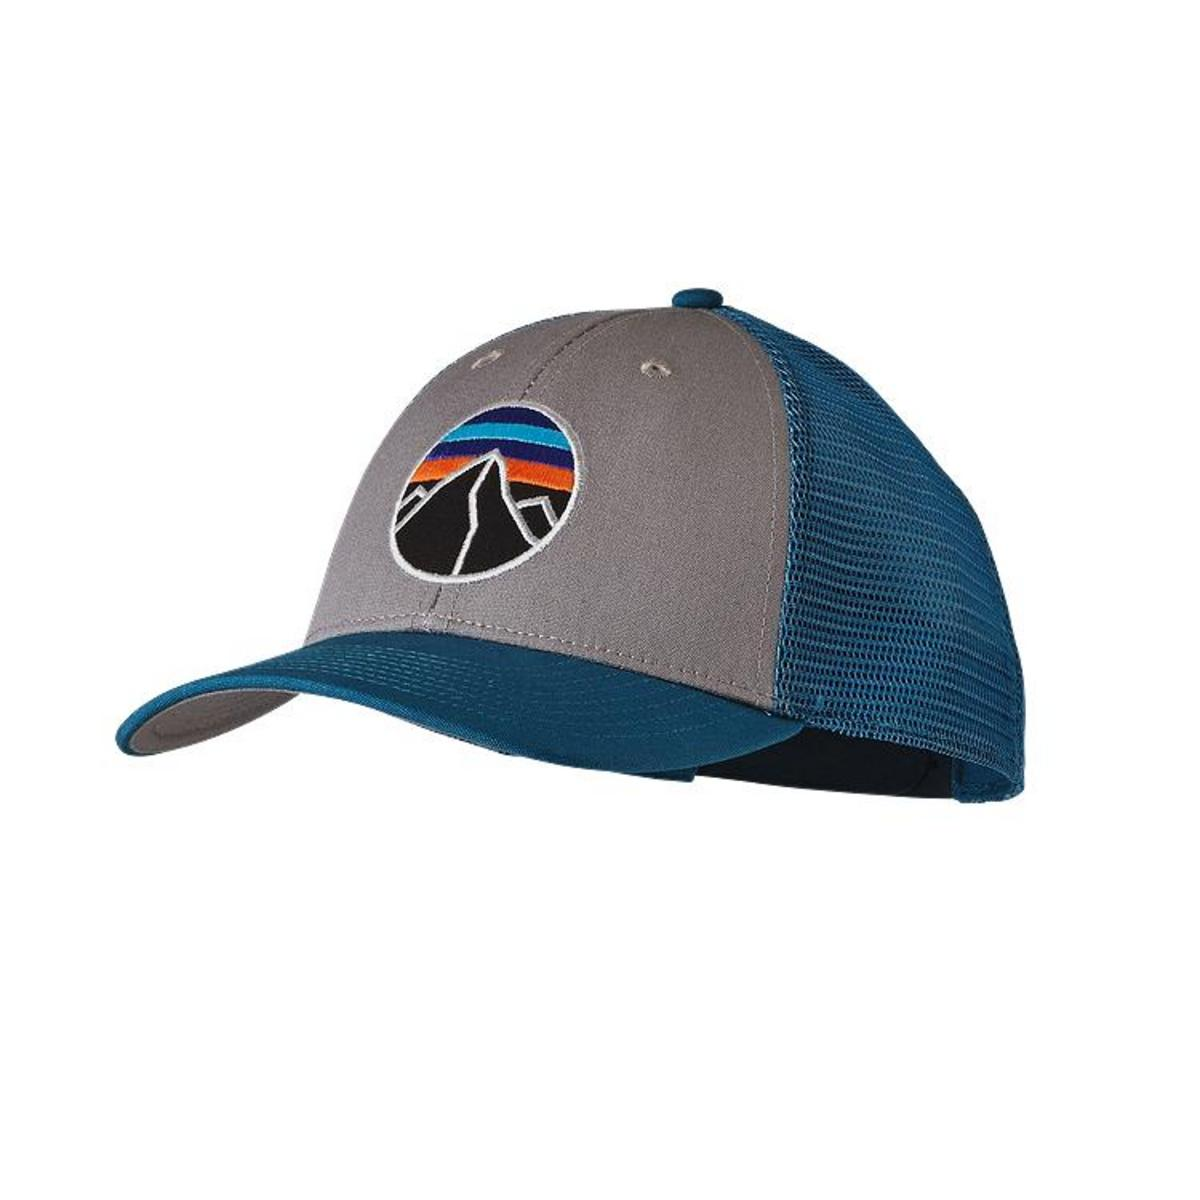 43d423b35aa Patagonia Fitz Roy Emblem LOPRO Trucker Hat